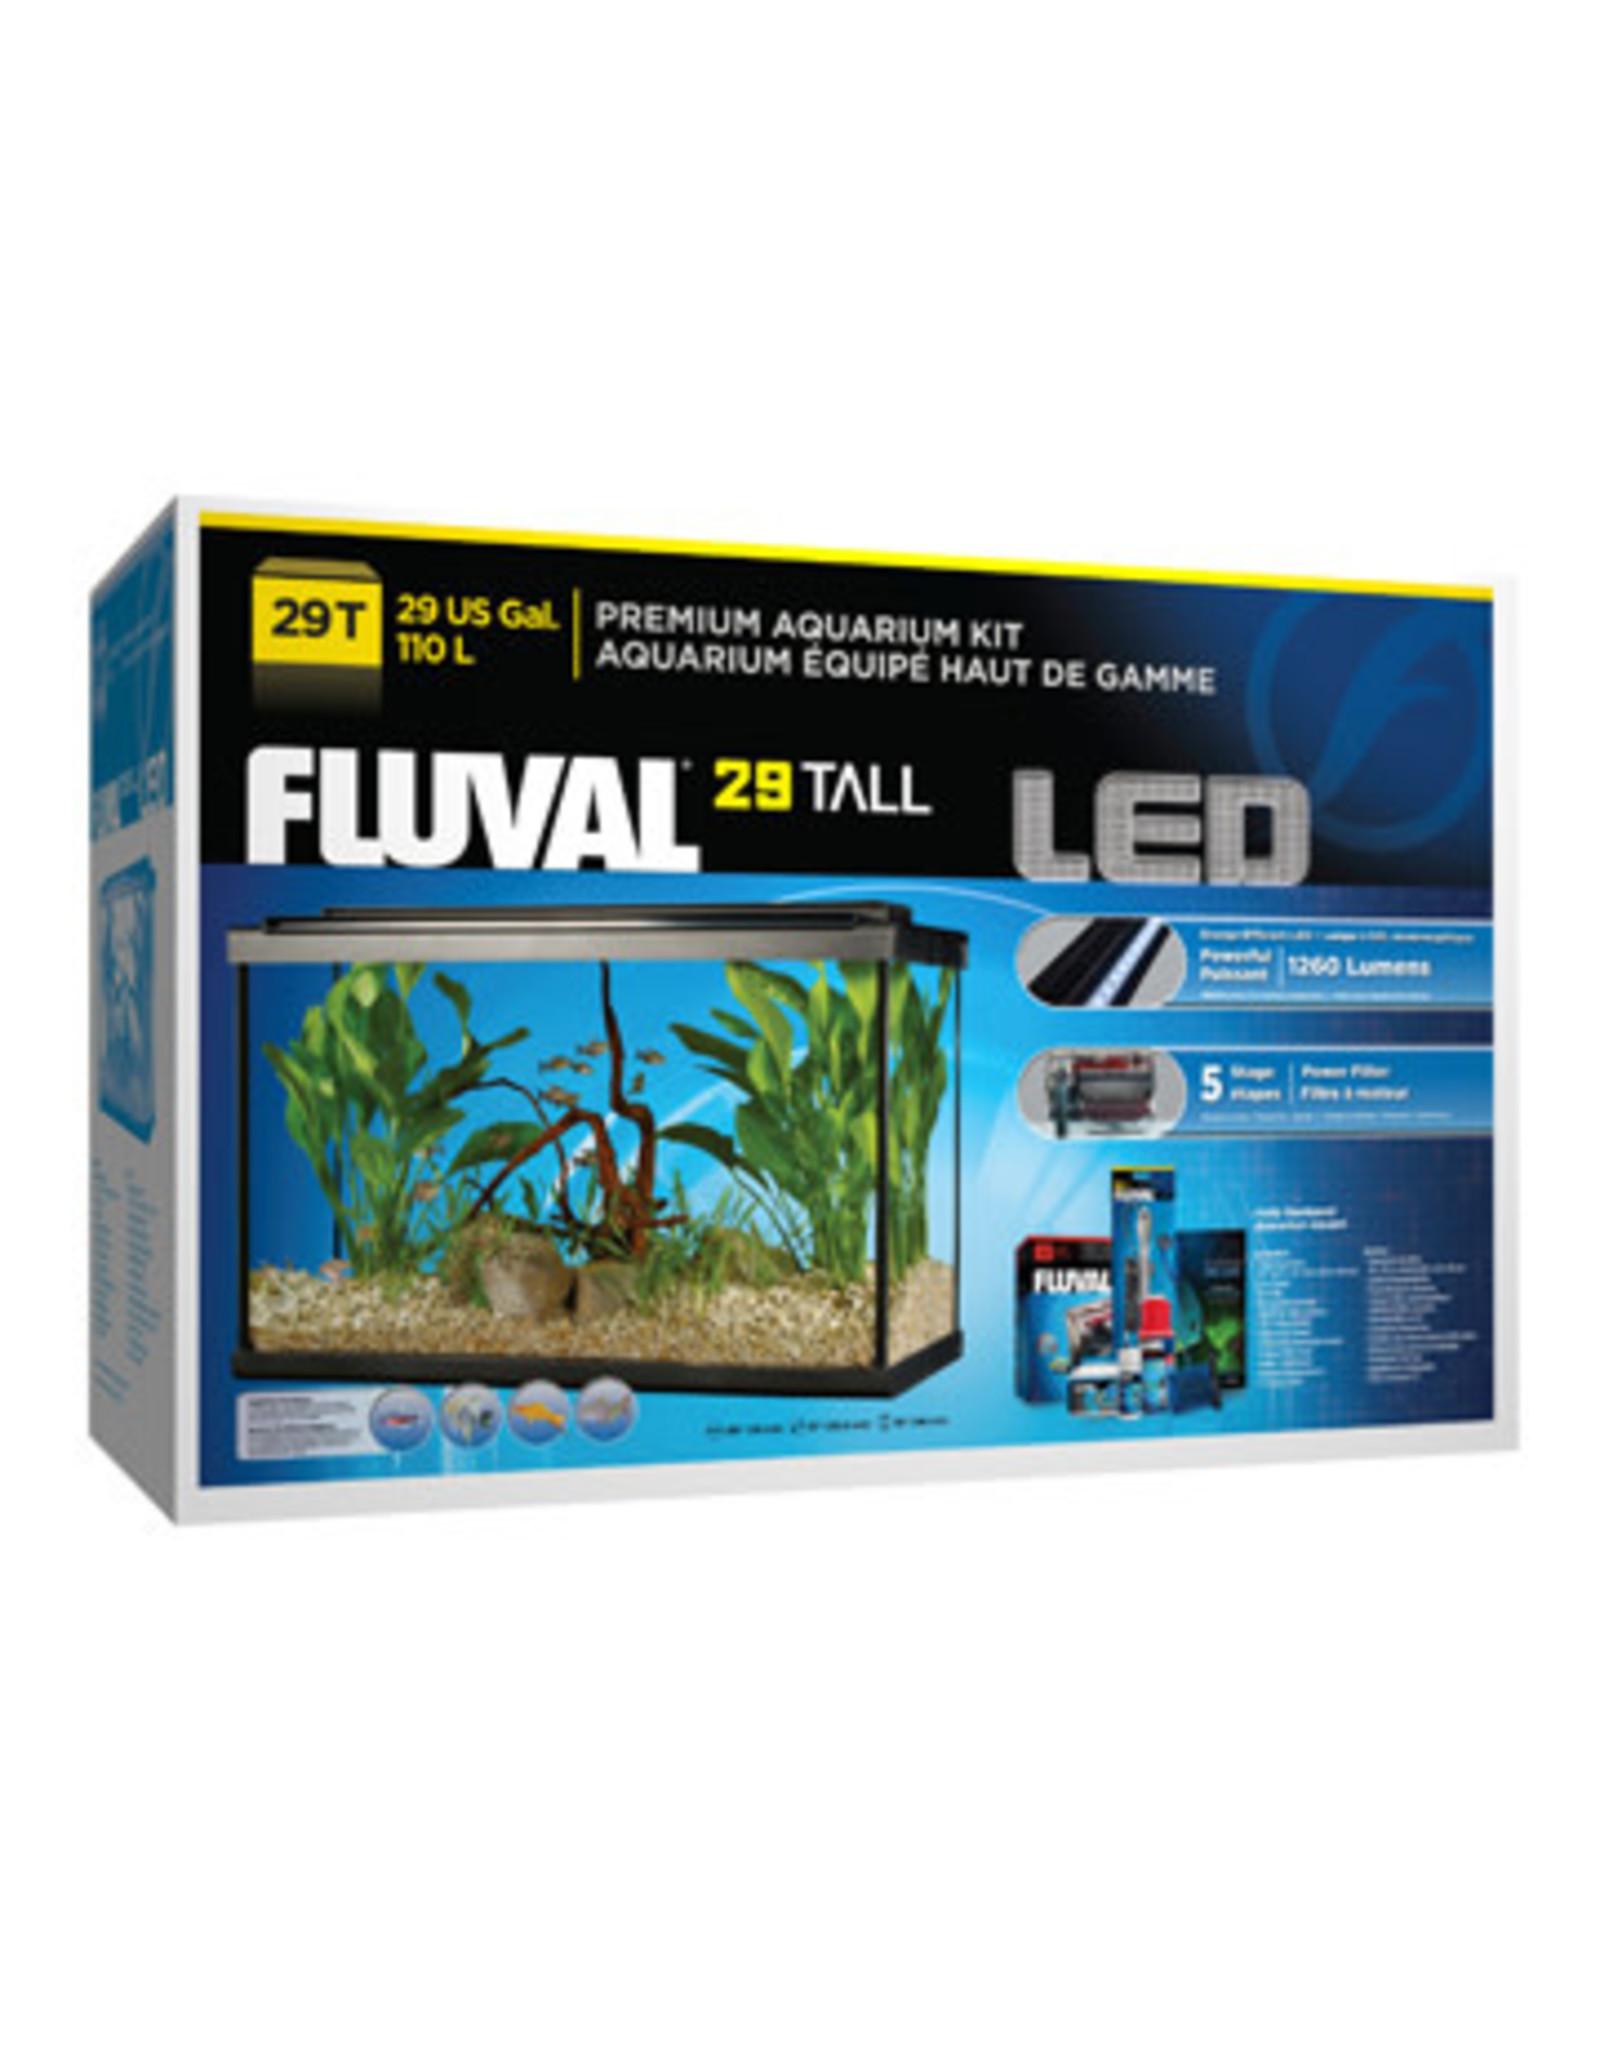 Fluval Fluval Premium Aquarium Kit with LED - 29 Tall - 110 L (29 US Gal)